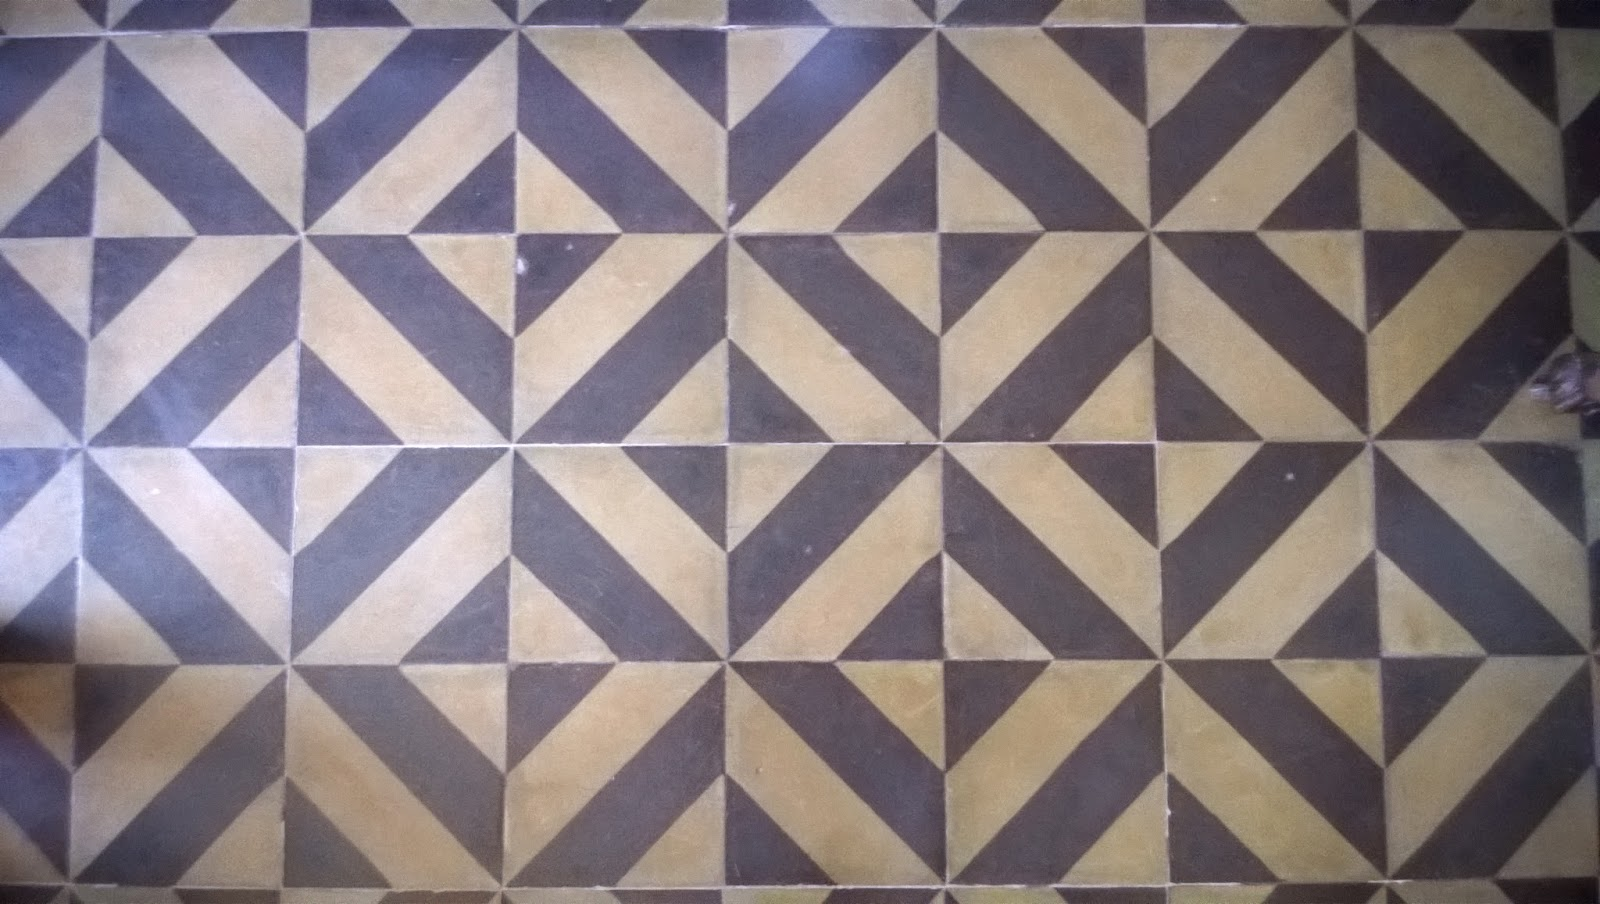 Pisos viejos for Disenos para mosaicos